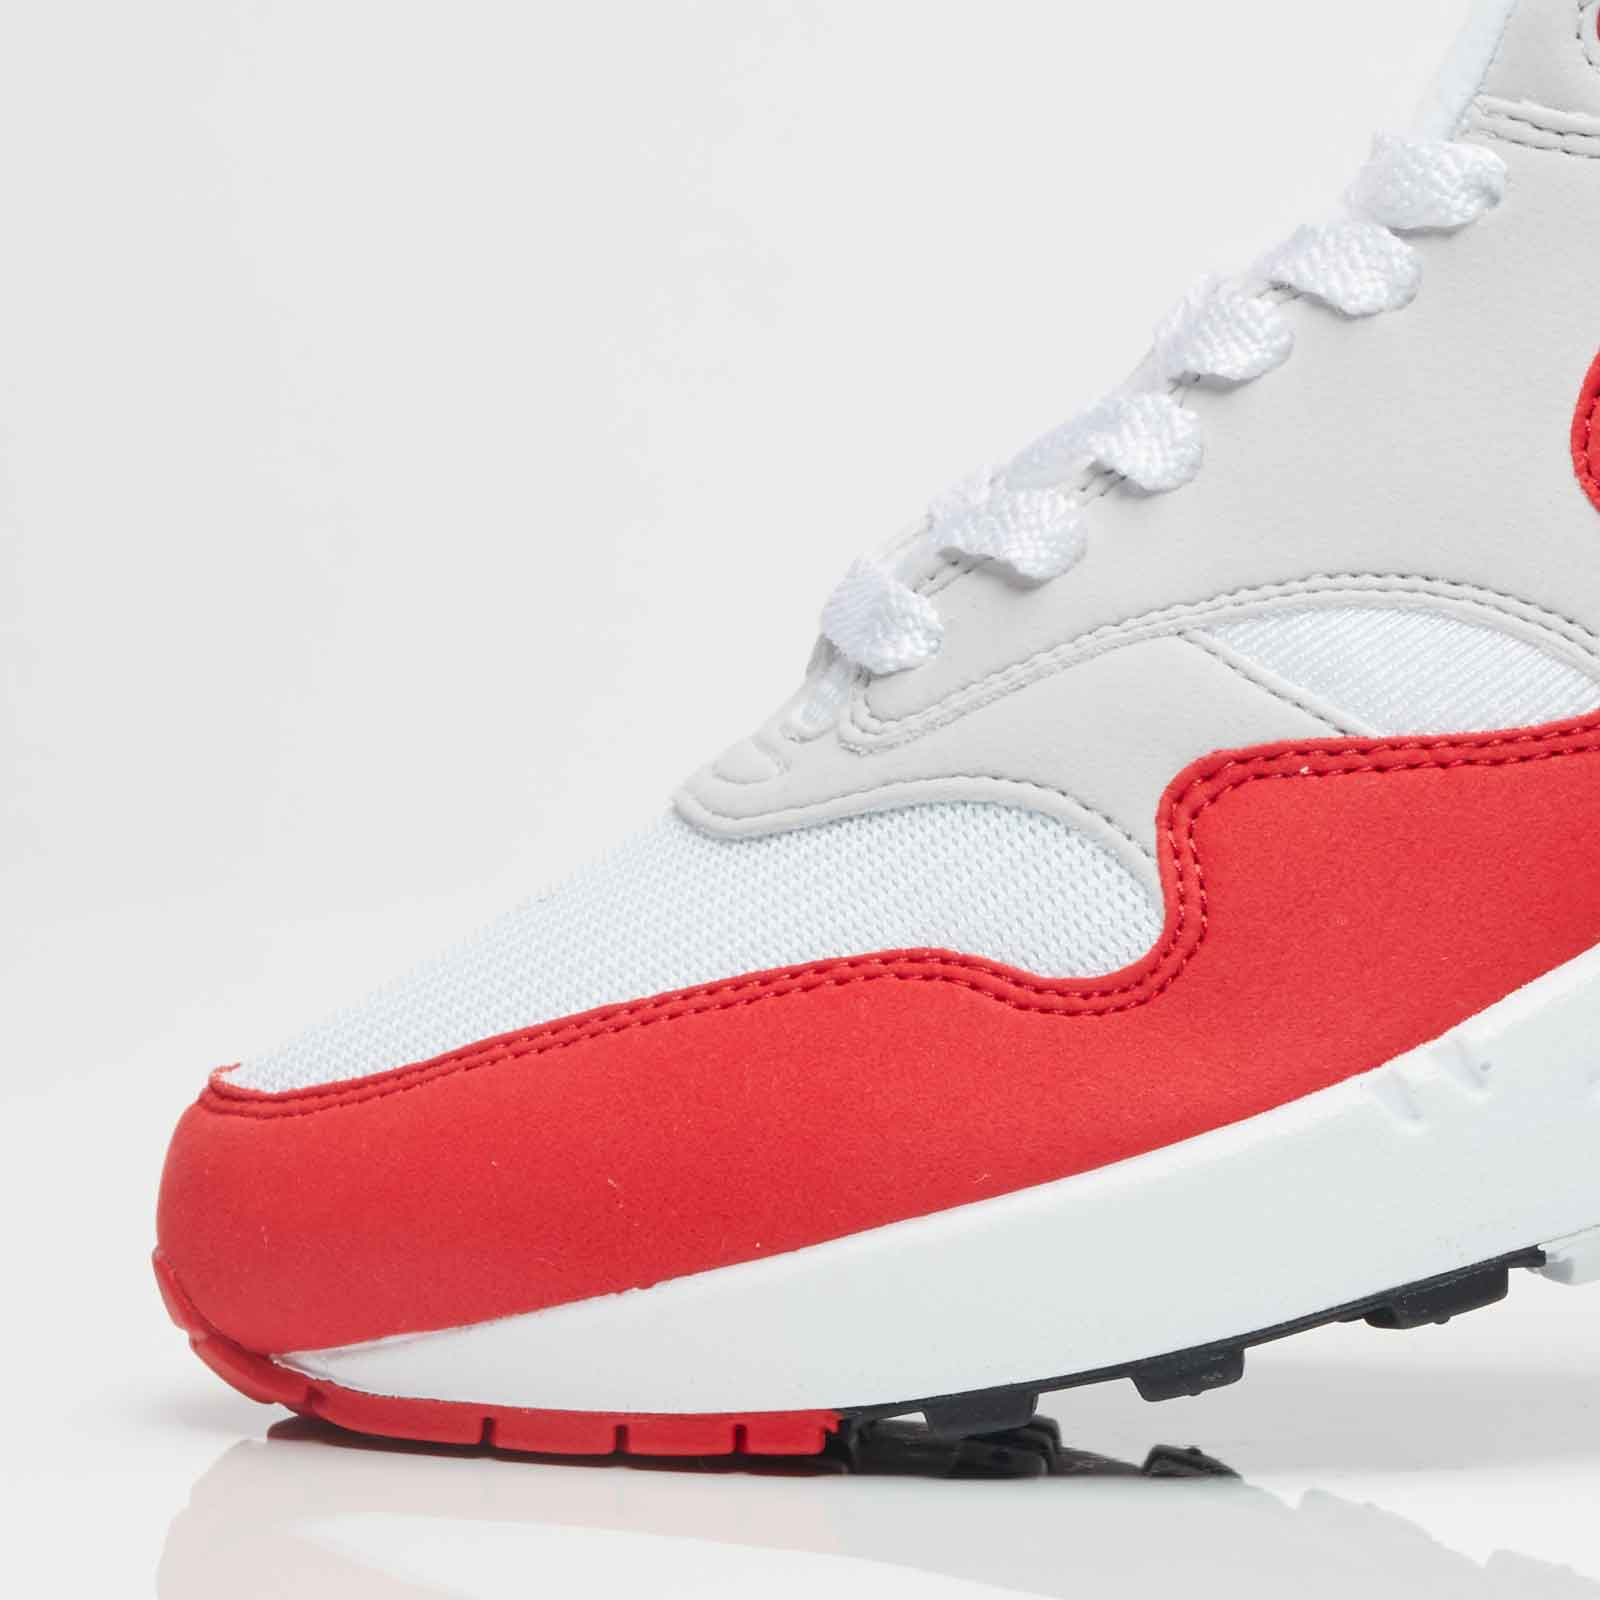 huge selection of 53064 d8bb9 Nike Air Max 1 Anniversary - 908375-103 - Sneakersnstuff   sneakers    streetwear online since 1999